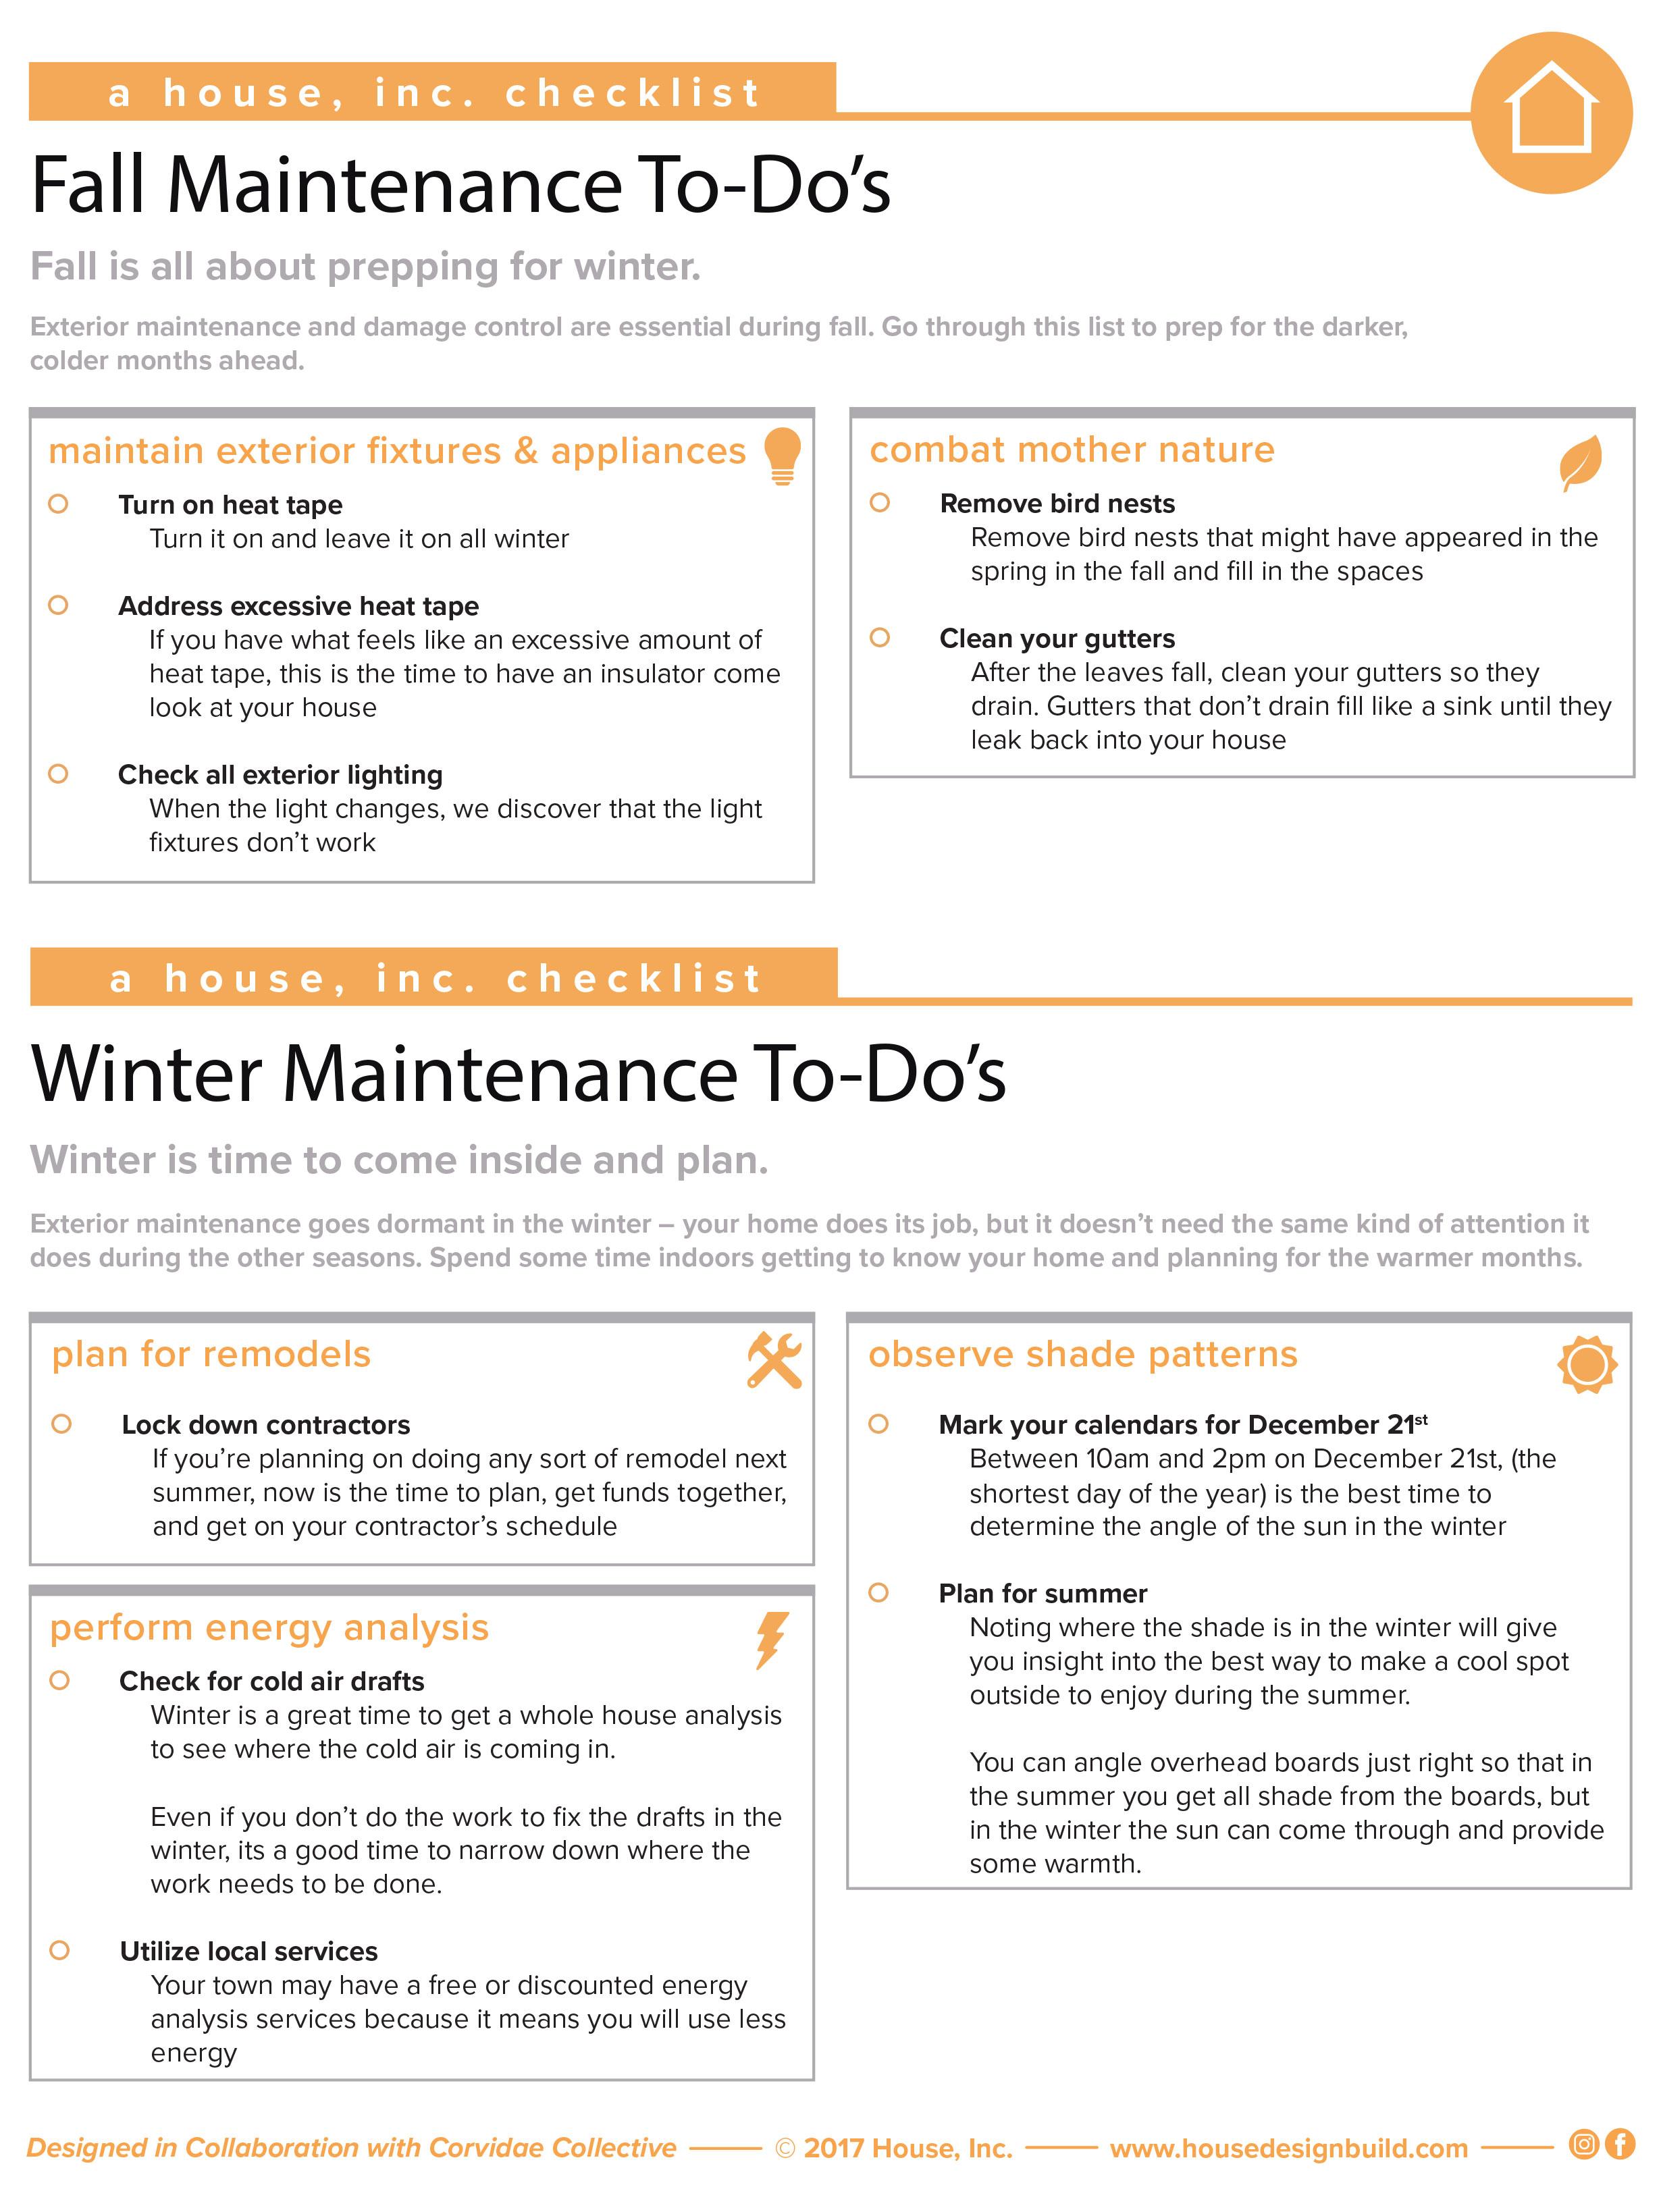 Fall Maintenance To-Do's